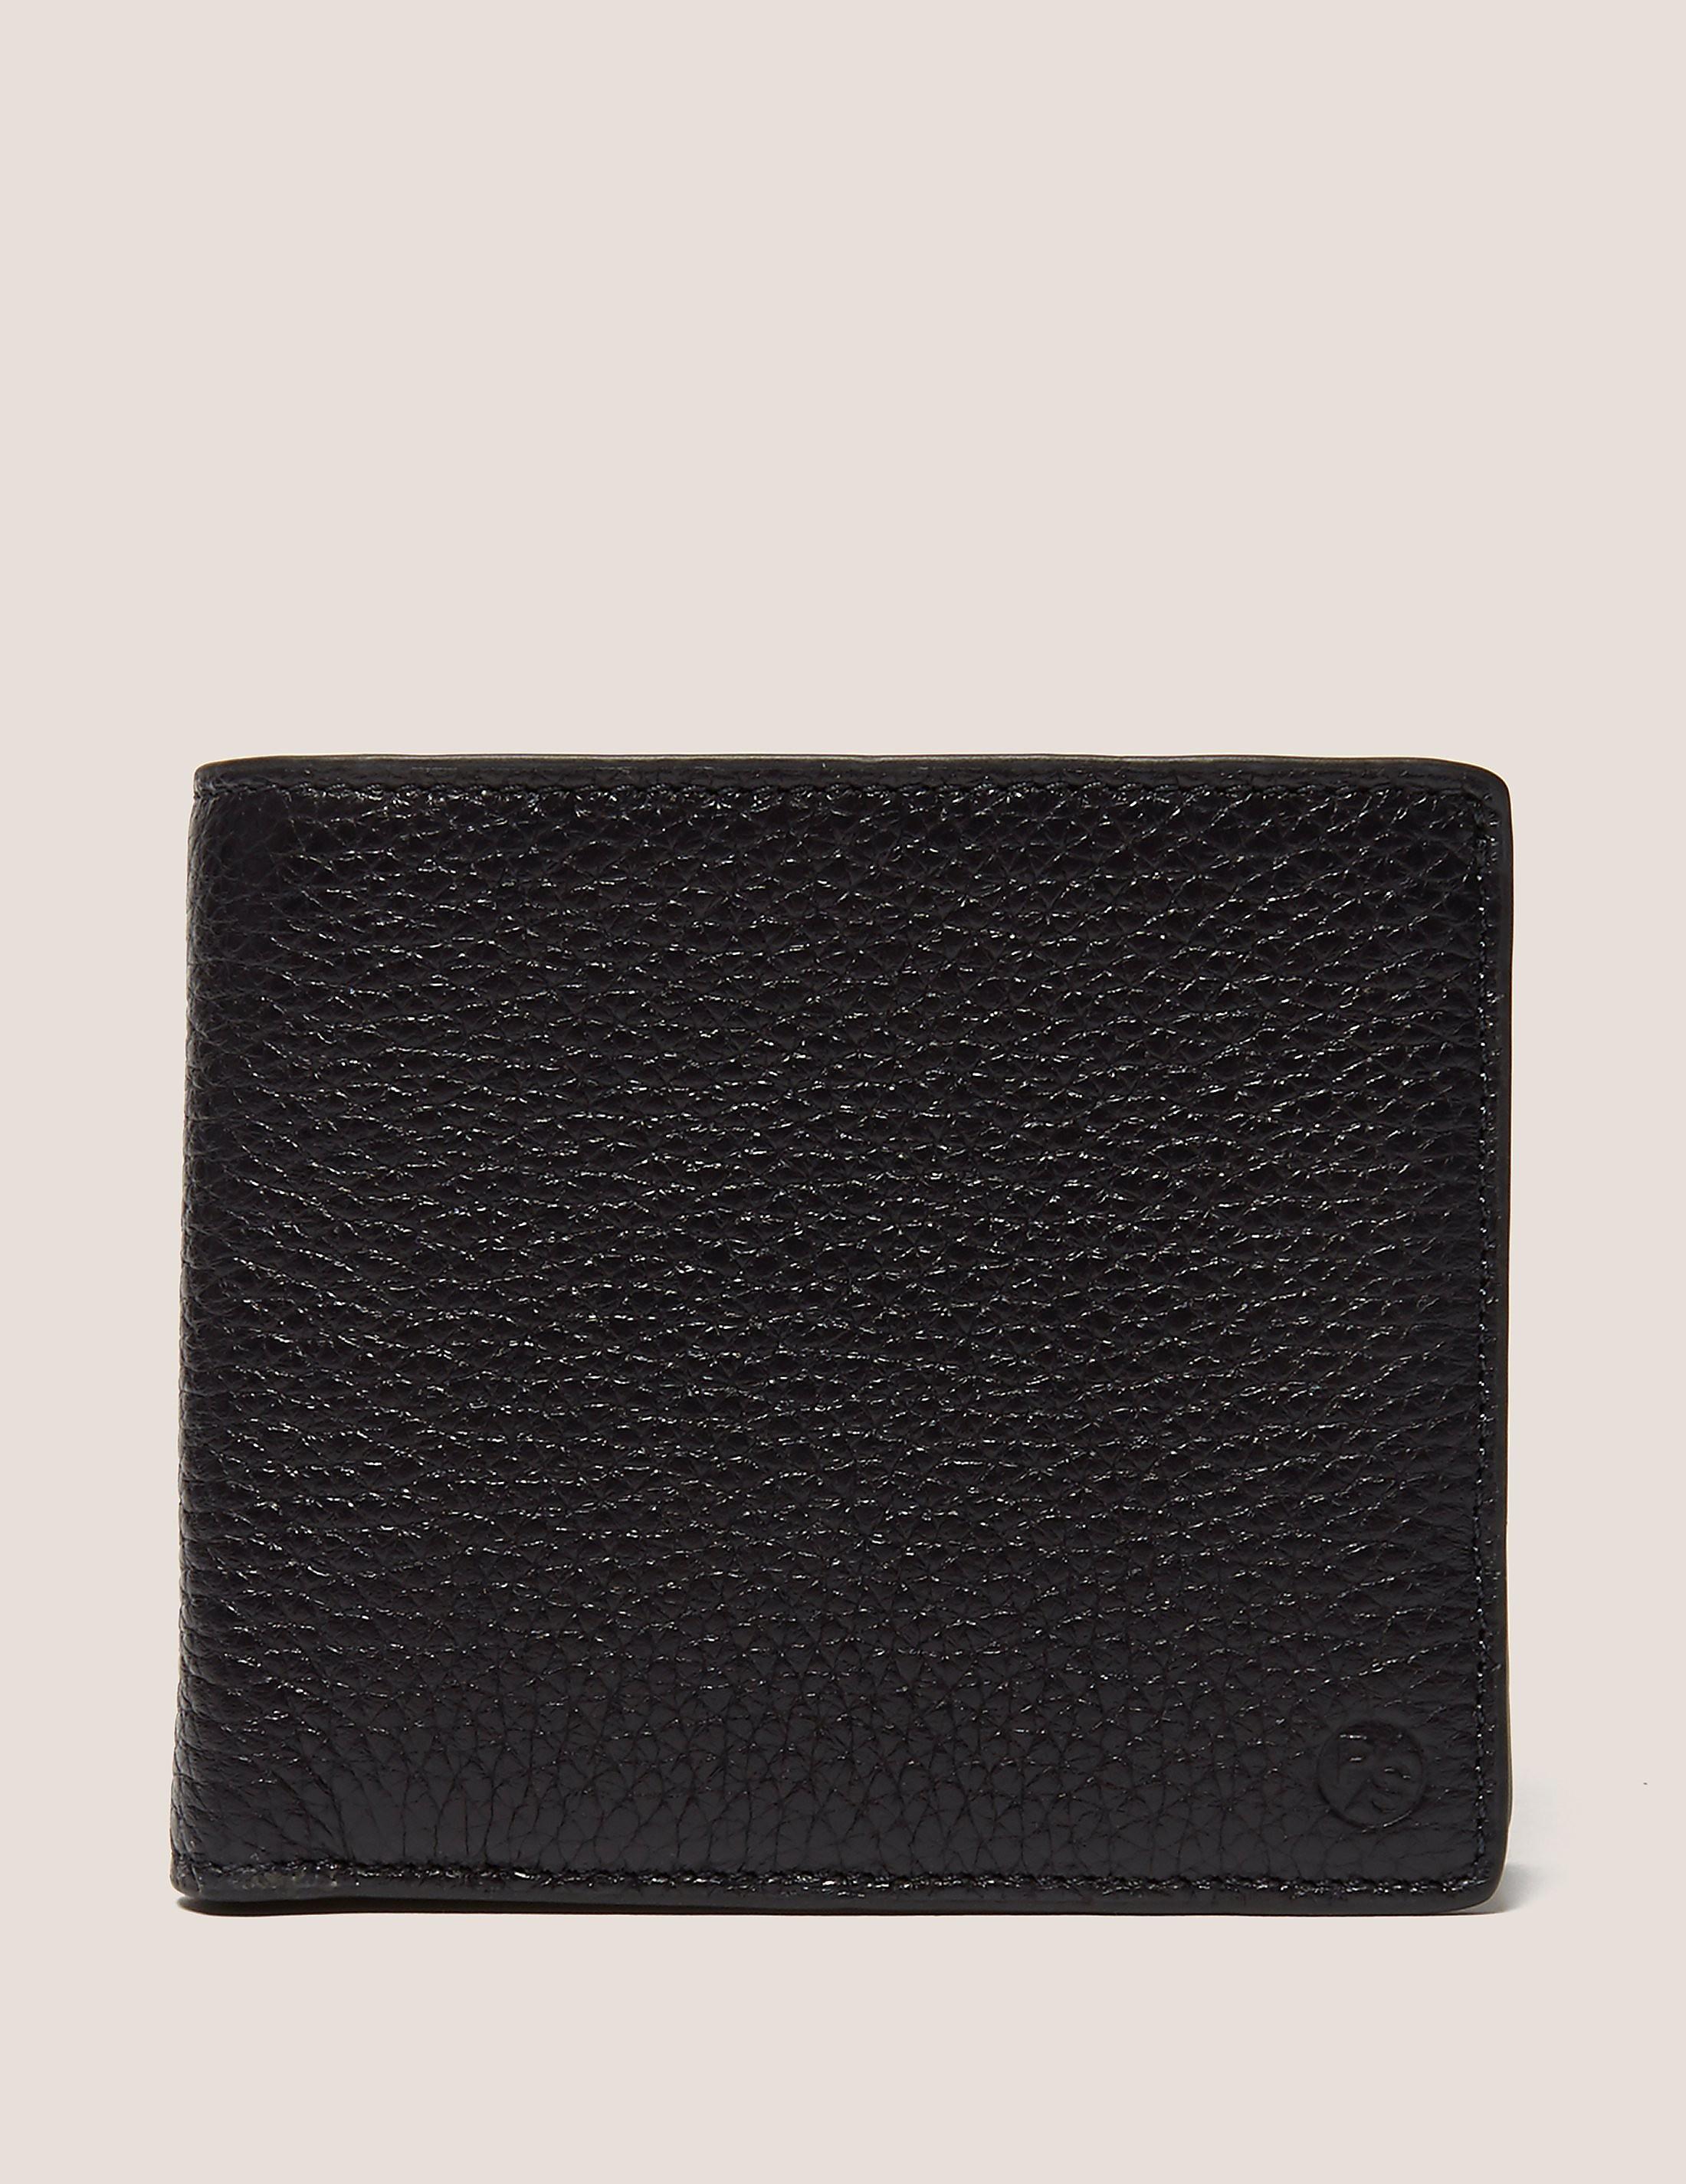 Paul Smith Sporty Leather Billfold Wallet